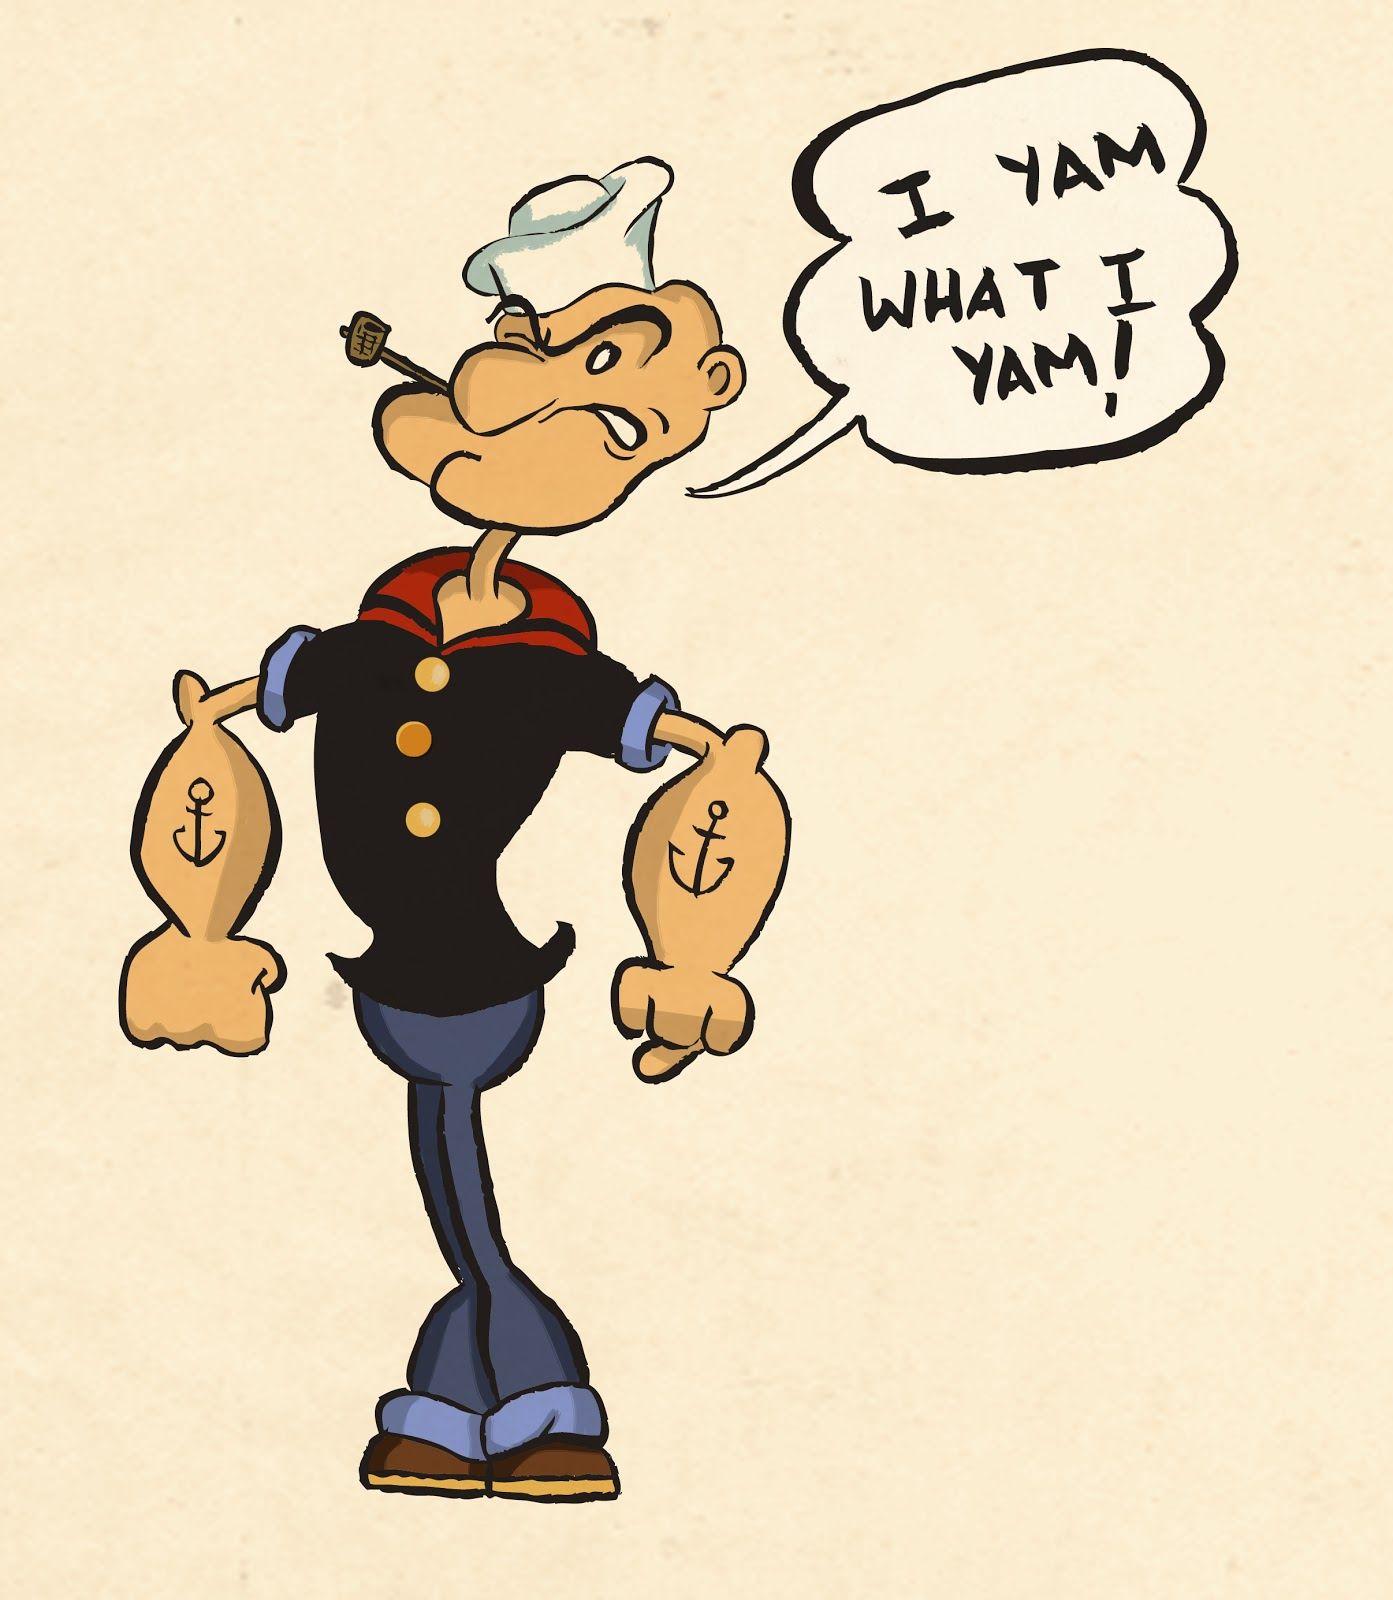 Popeye The Sailor Free Desktop 8 Hd Wallpapers Popeye Popeye The